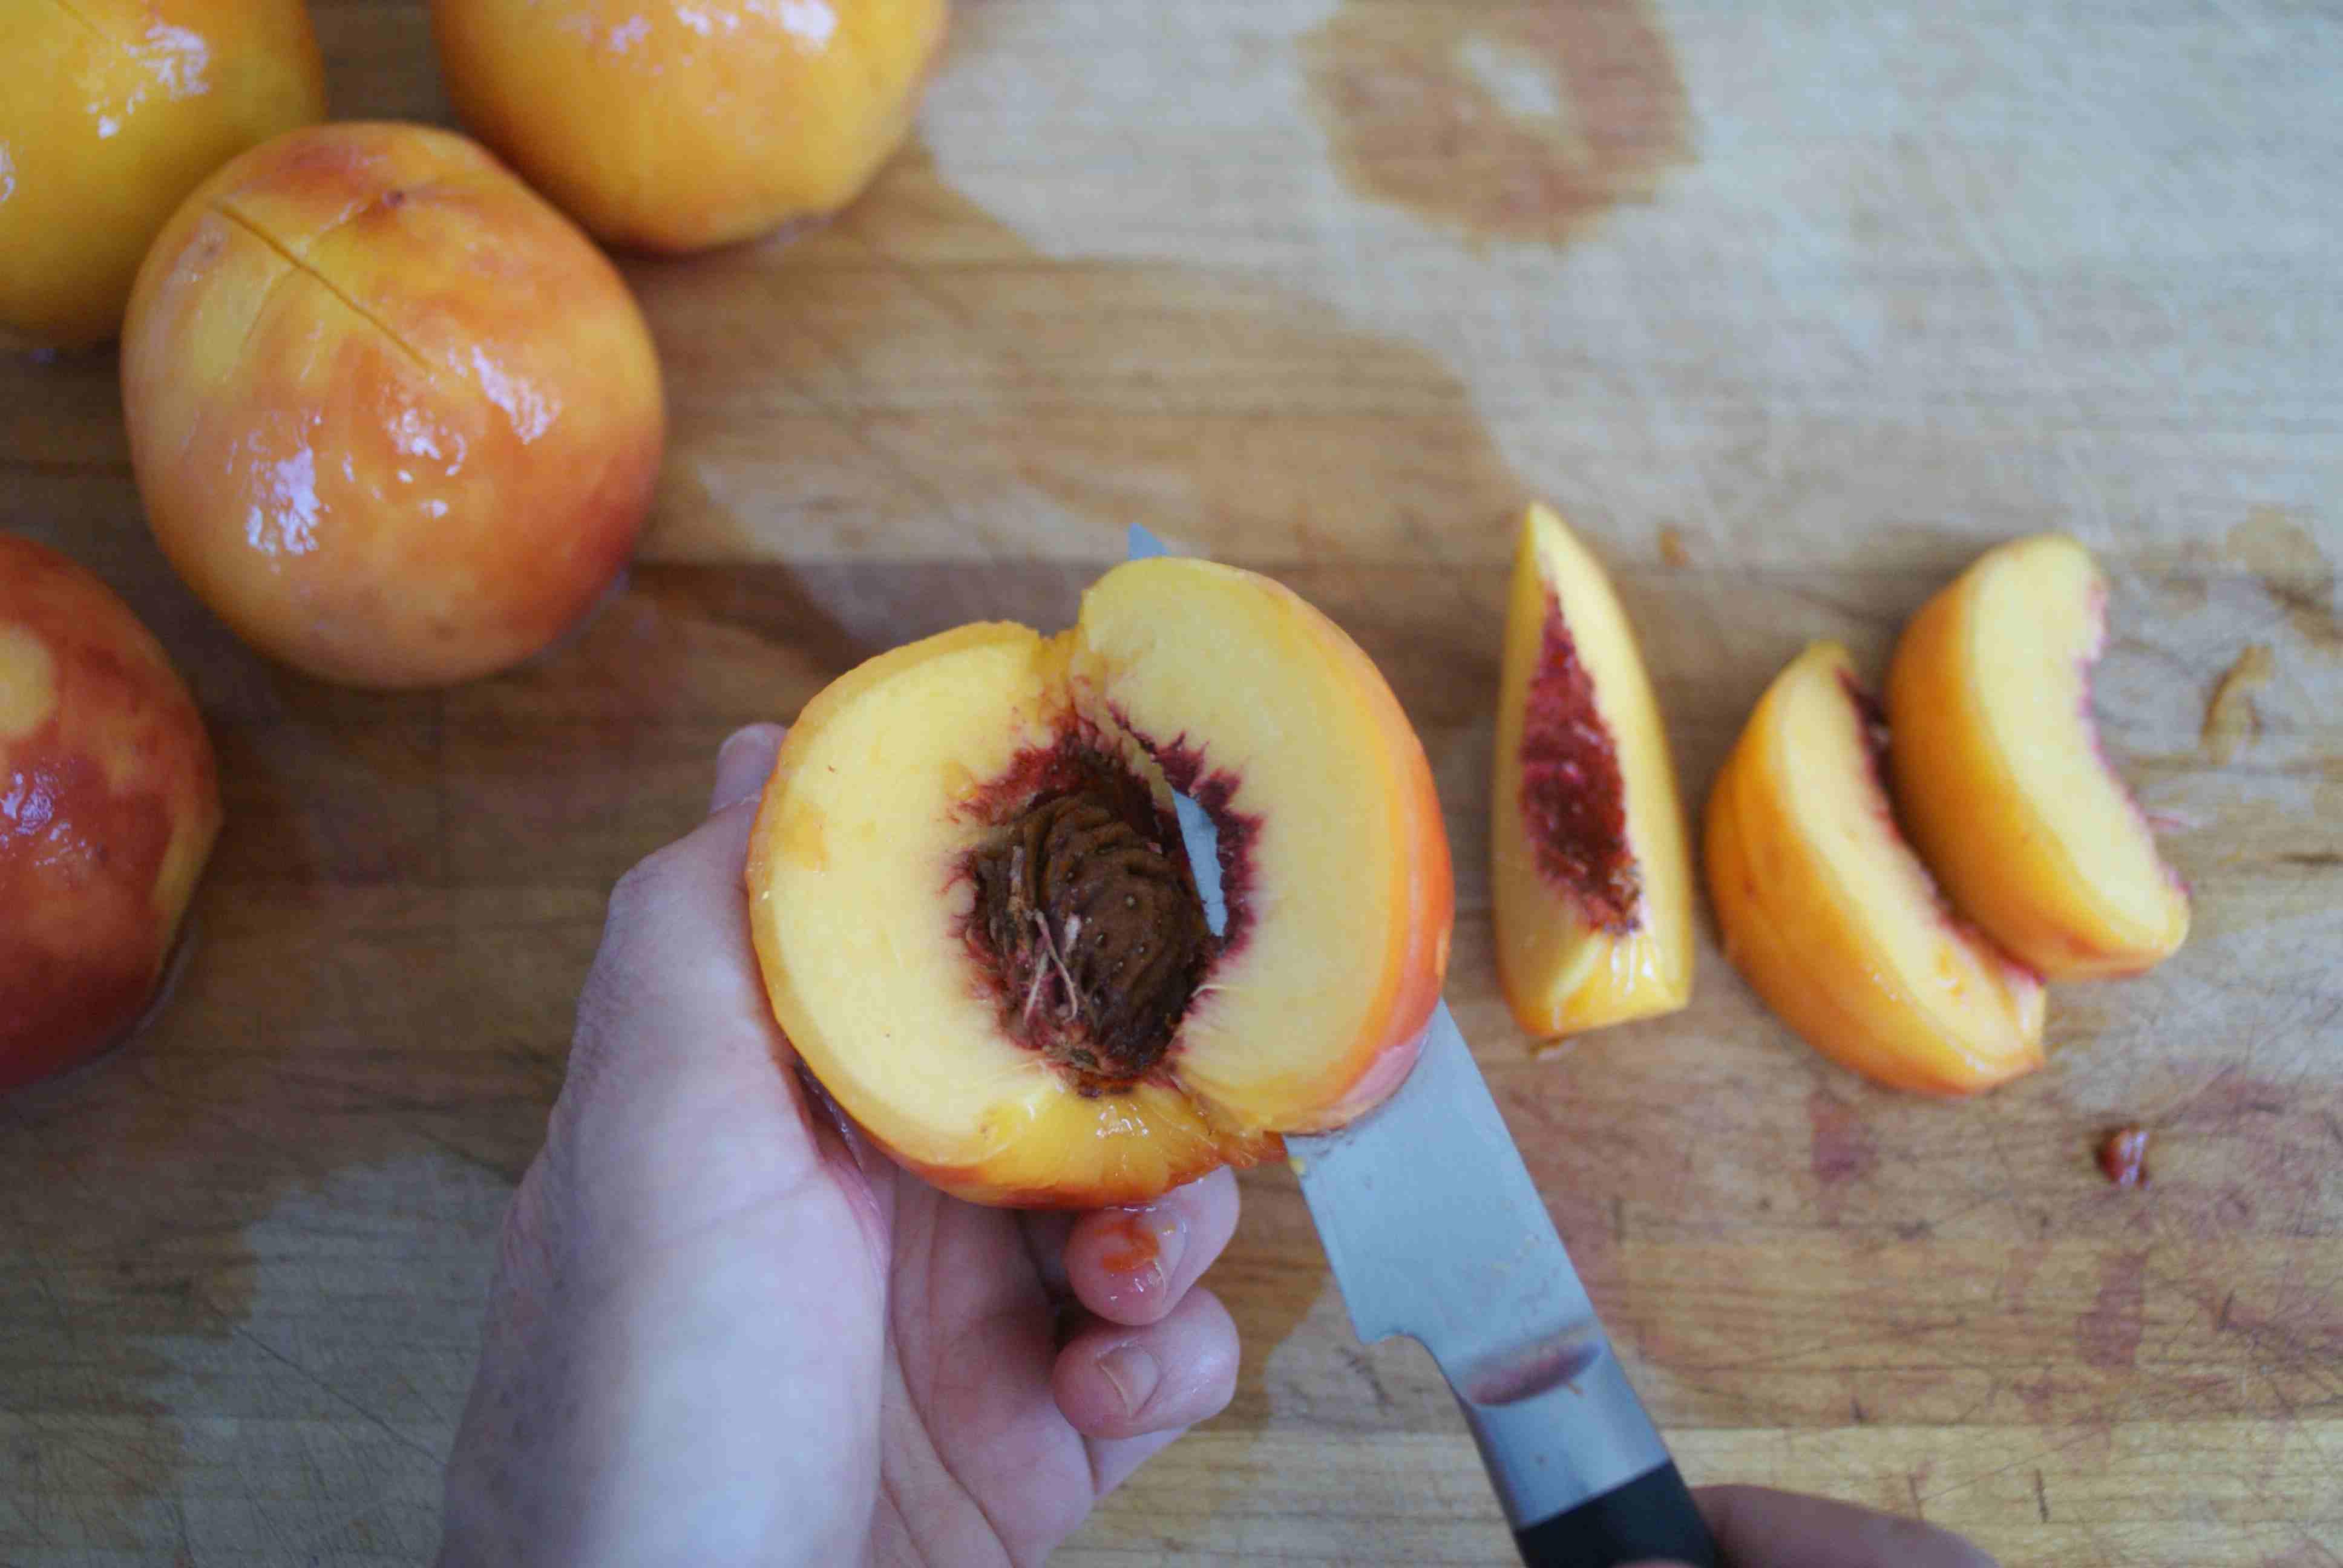 Slicing a Peeled Peach